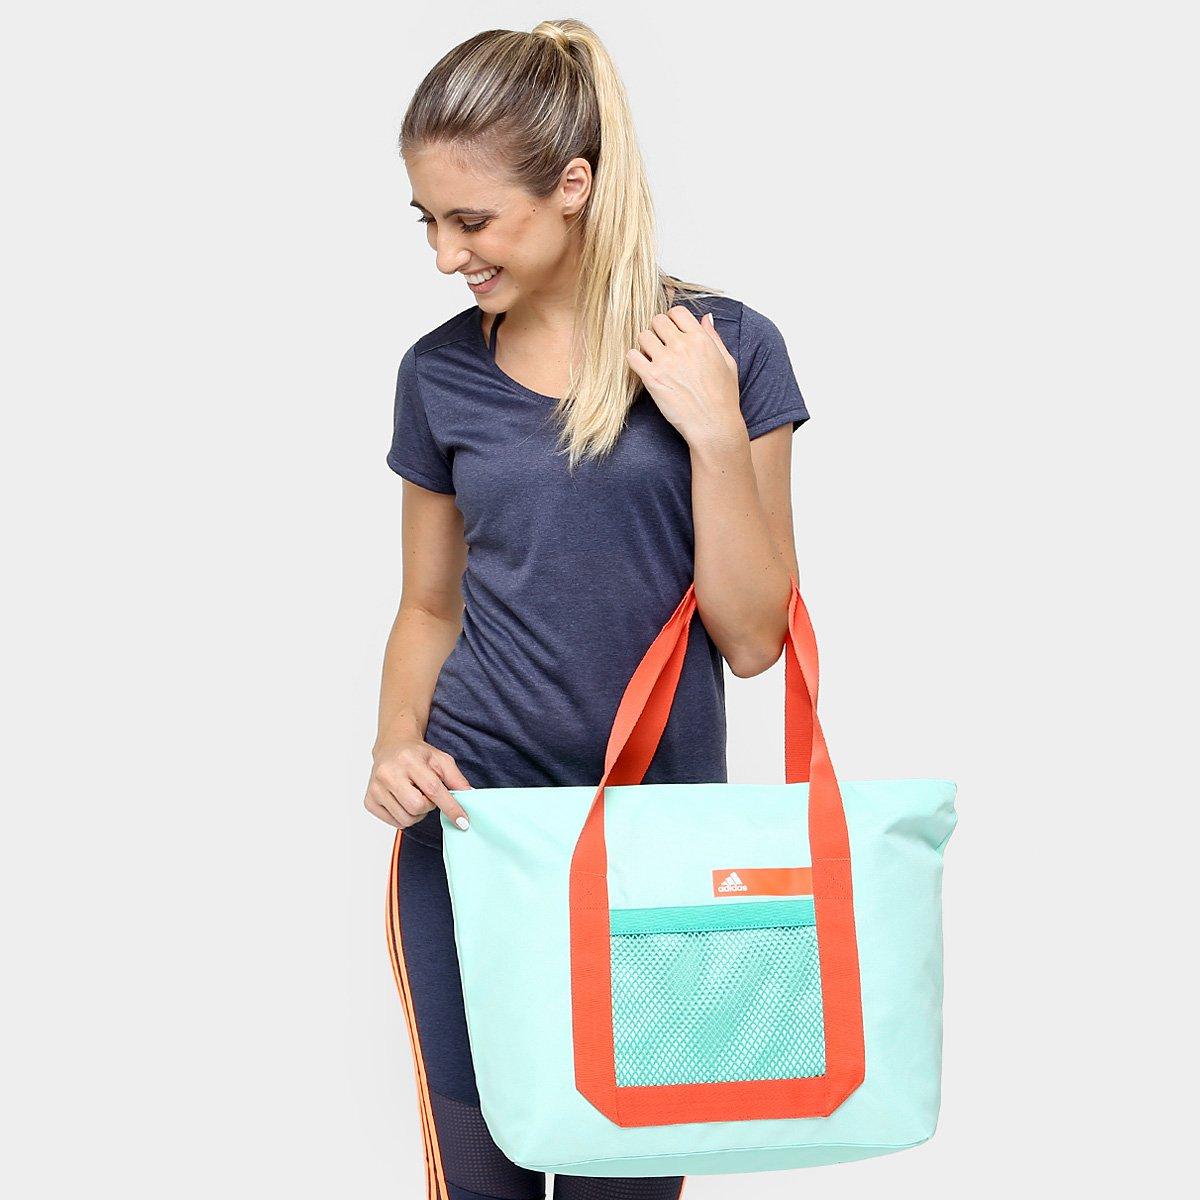 AgoraNetshoes Bolsa Compre Favourites Feminina Adidas Good l1cTKJF